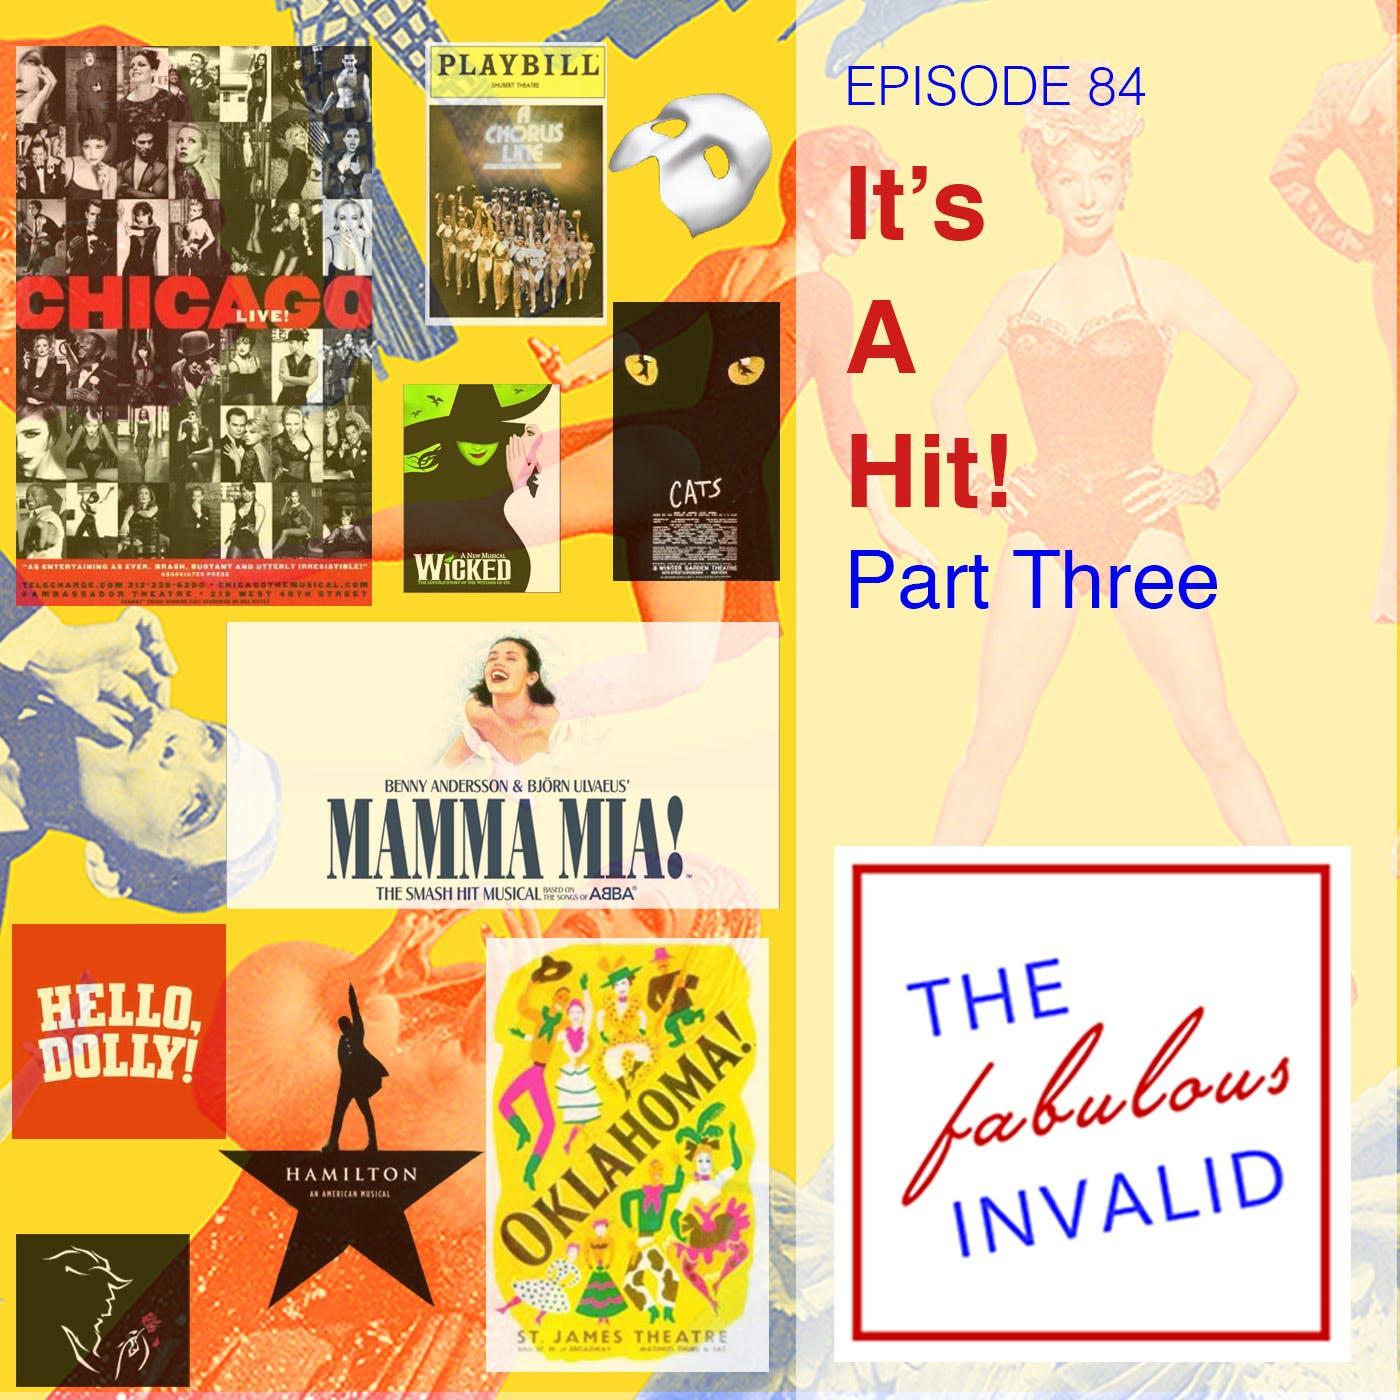 Episode 84: It's A Hit! Part Three